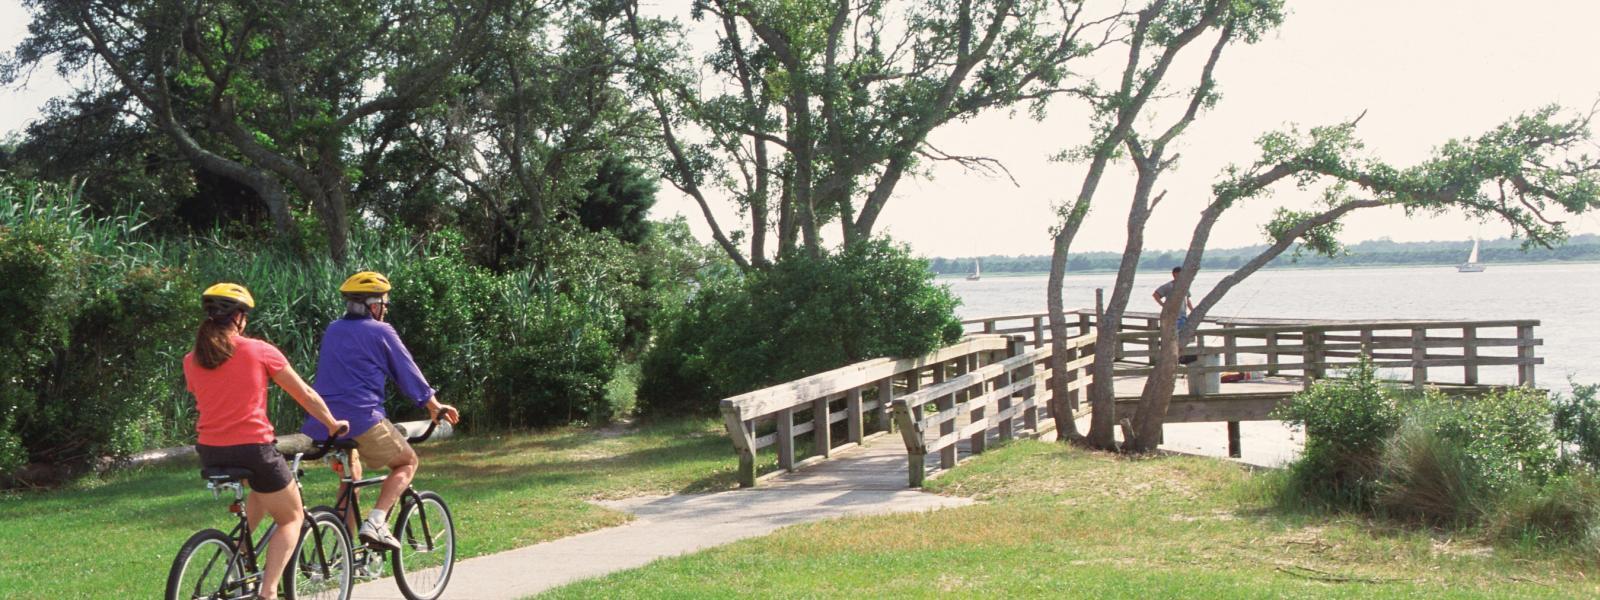 Biking Hiking Amp Nature Trails In Wilmington North Carolina